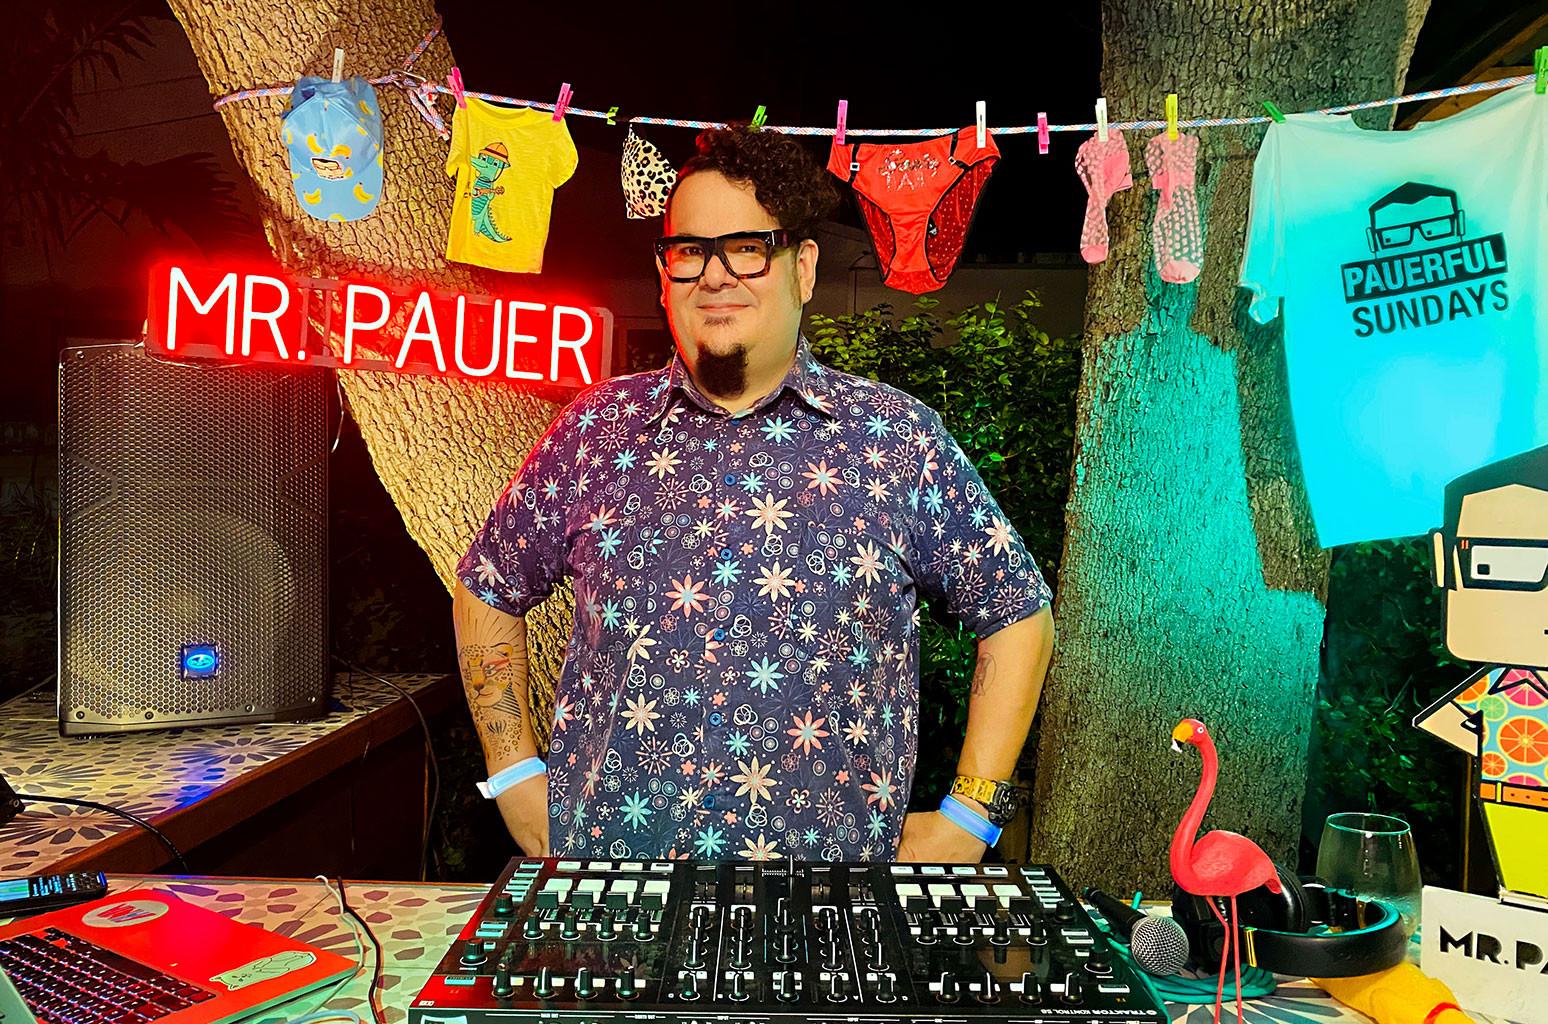 Mr. Pauer